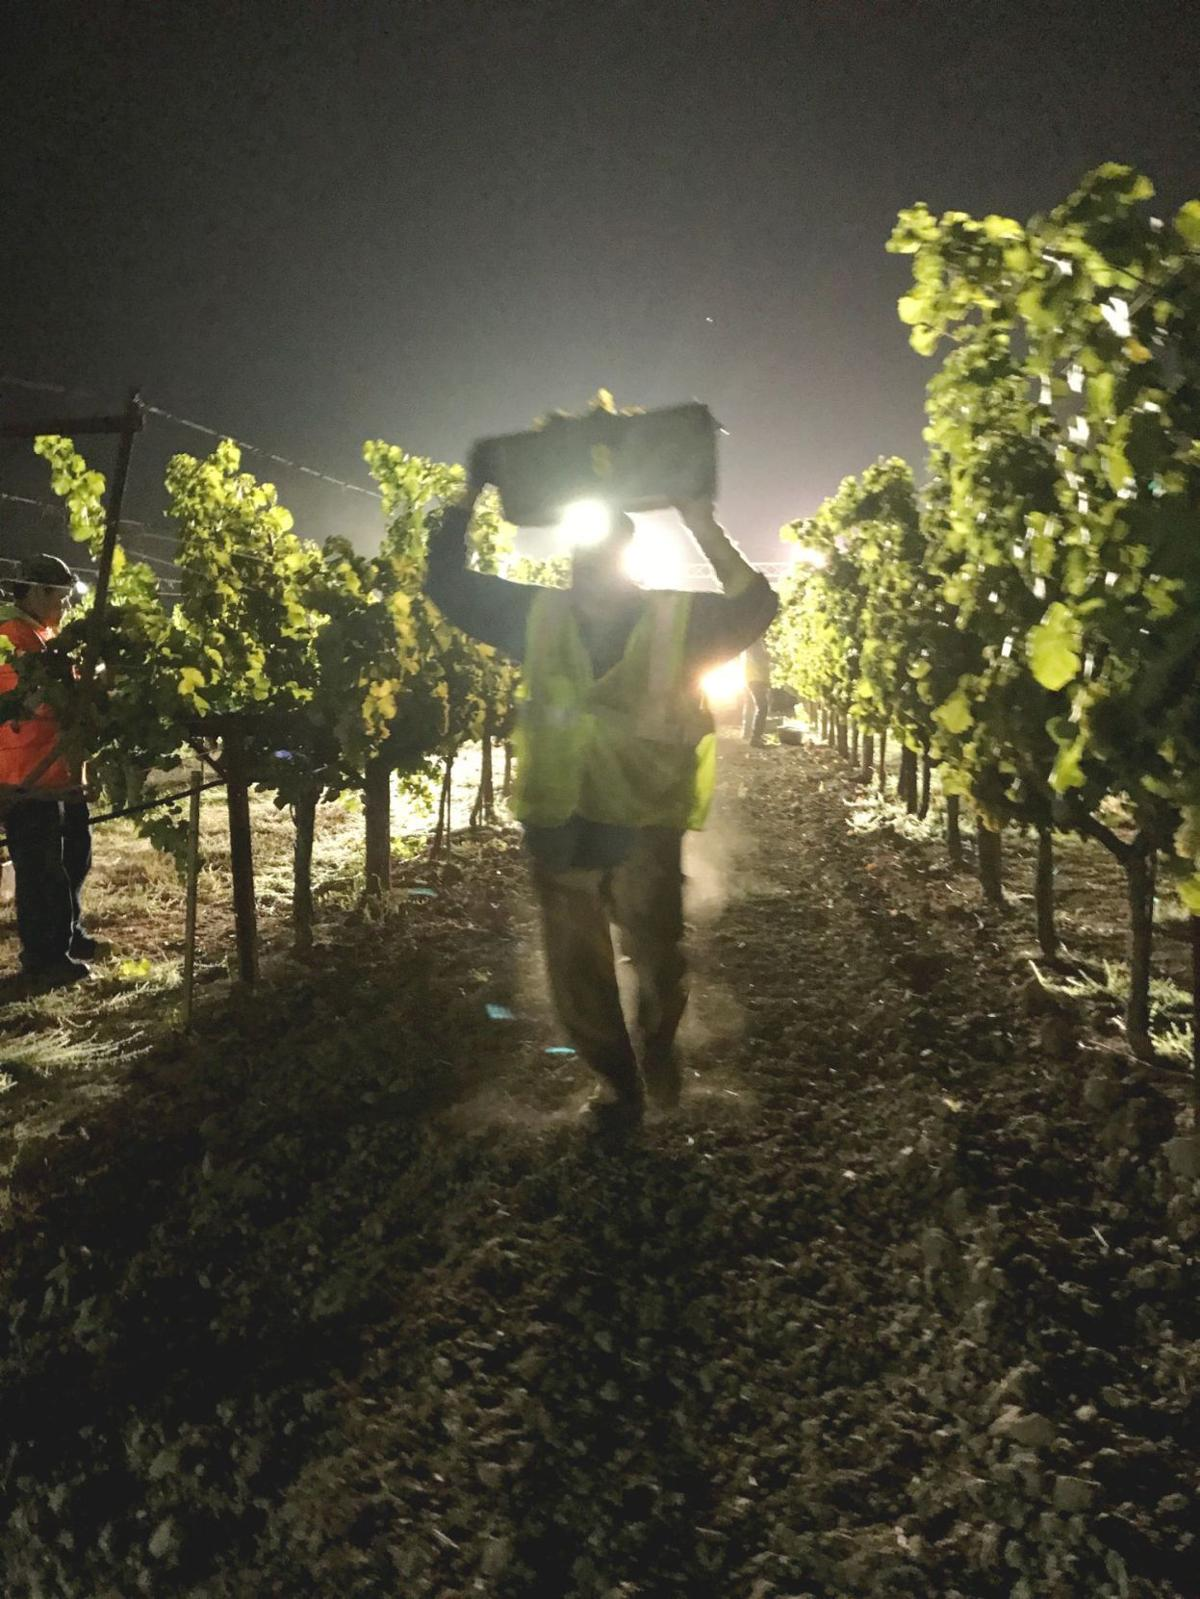 Duckhorn Vineyards' 40th harvest